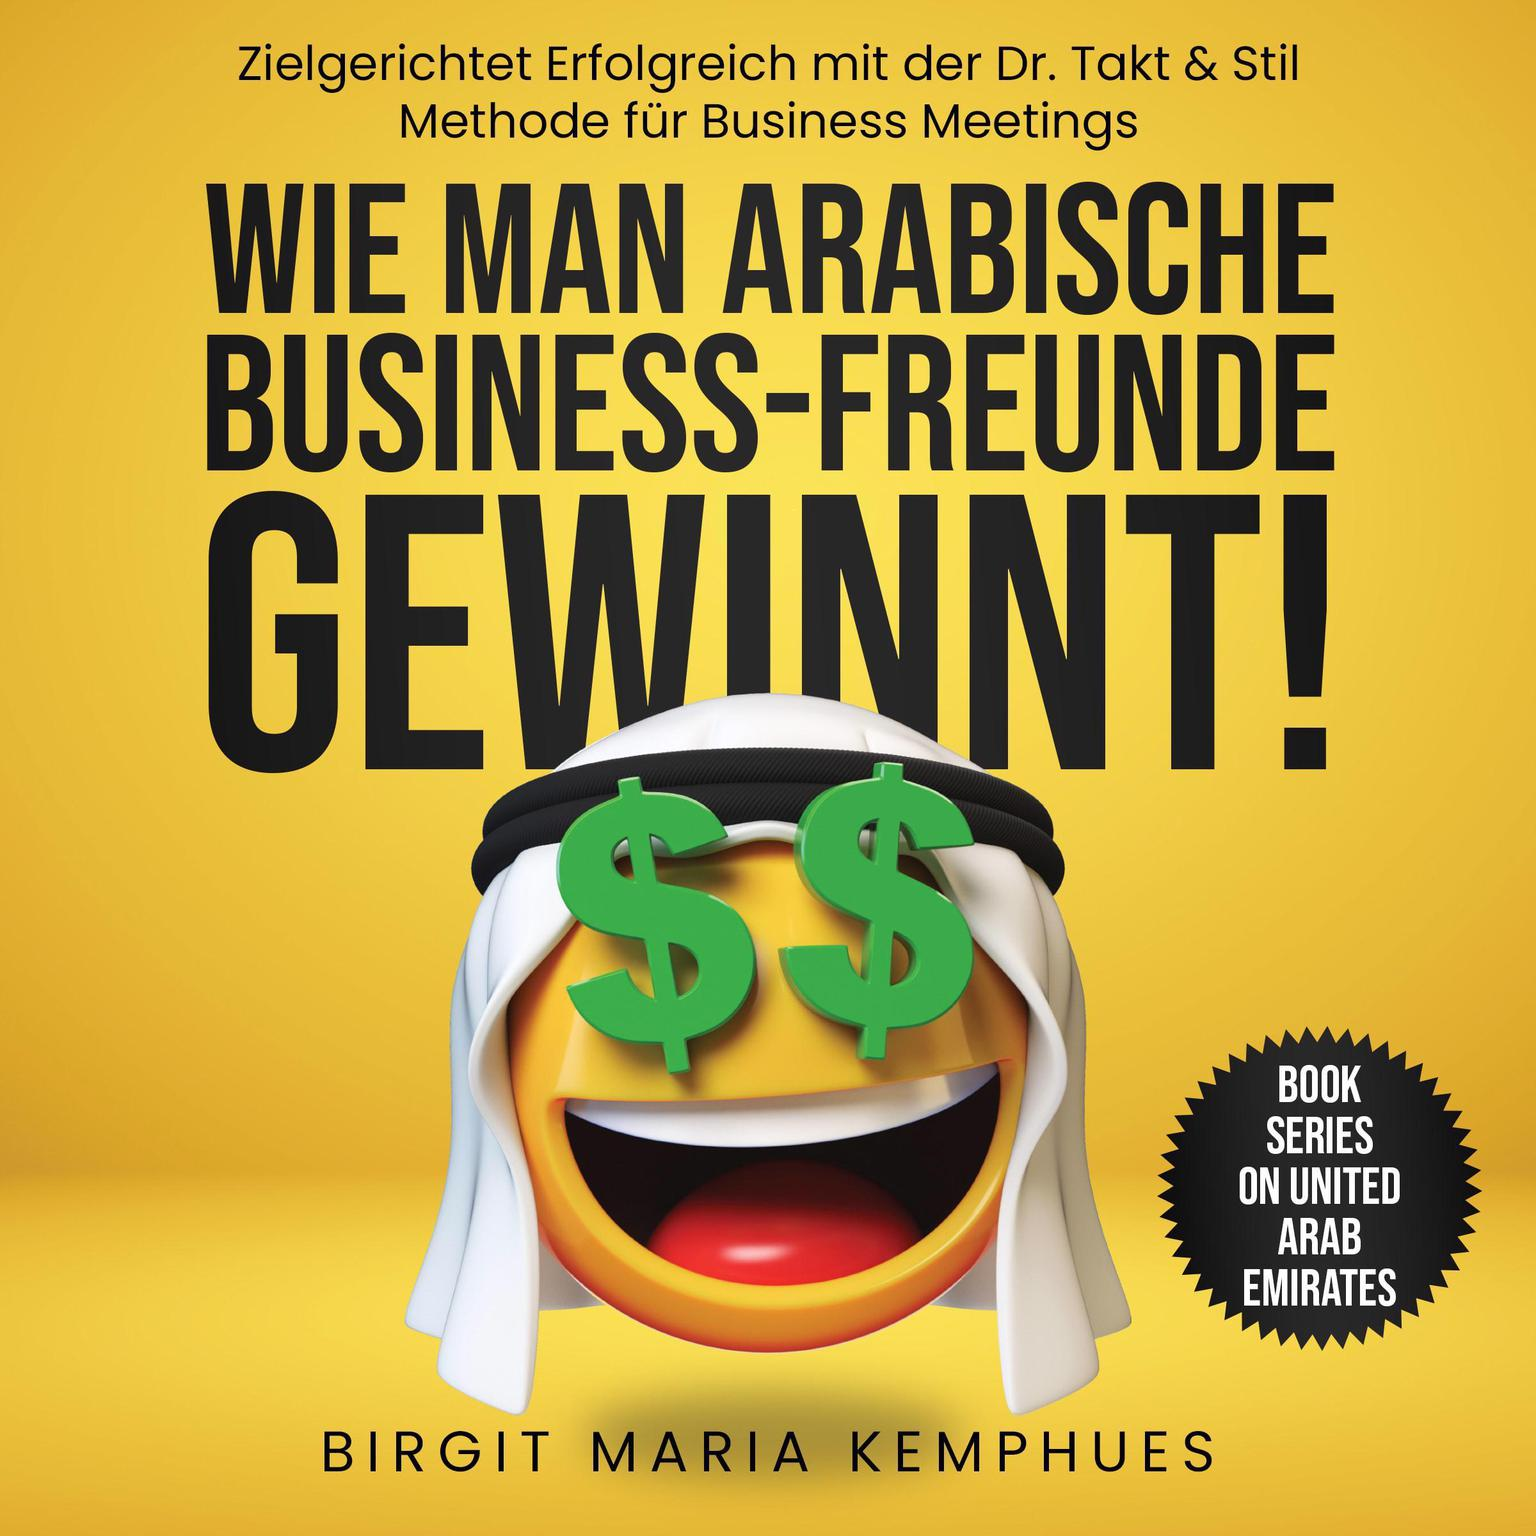 Wie man arabische Business Freunde gewinnt (Abridged) Audiobook, by Birgit Maria Kemphues